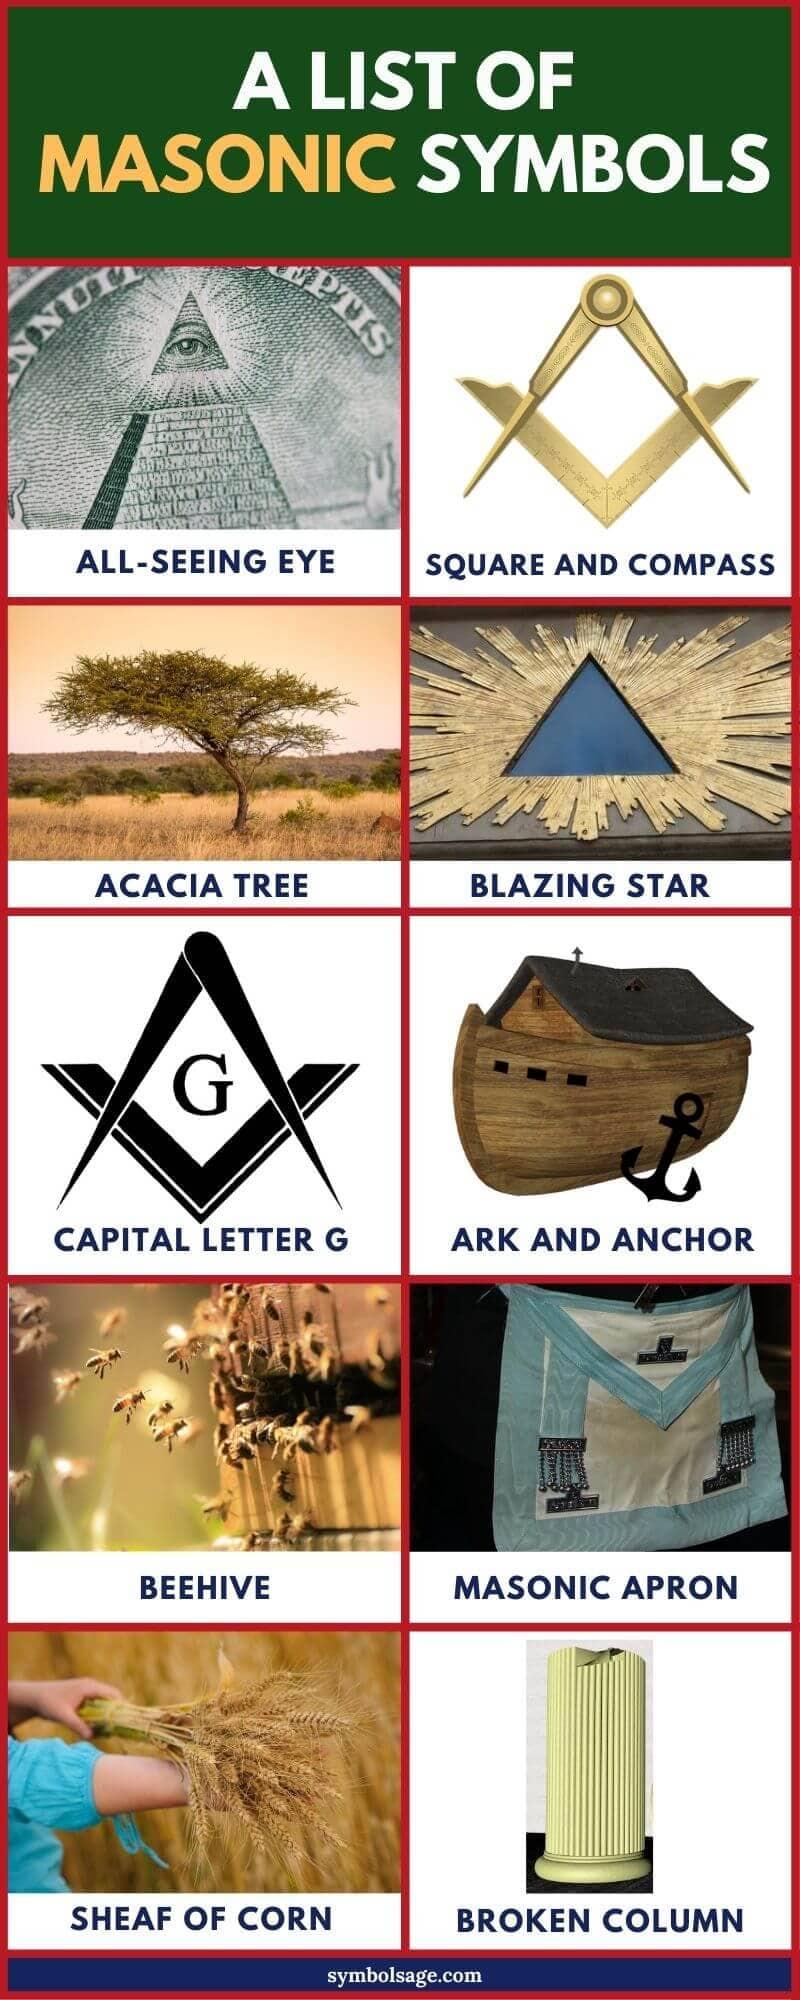 Masonic symbols list